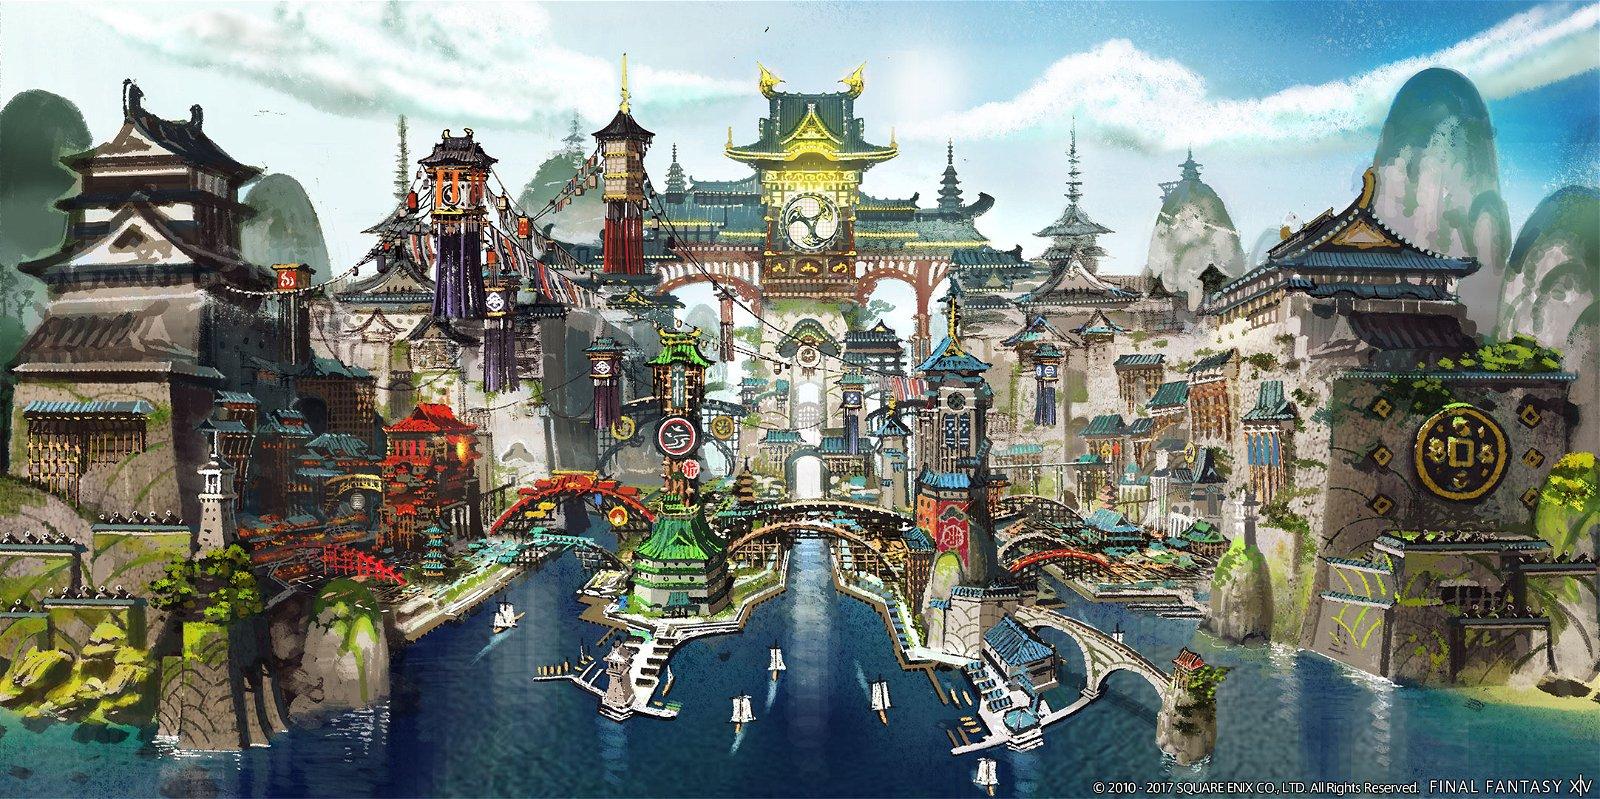 New Lands And Samurai Await In Final Fantasy Xiv: Stormblood 3